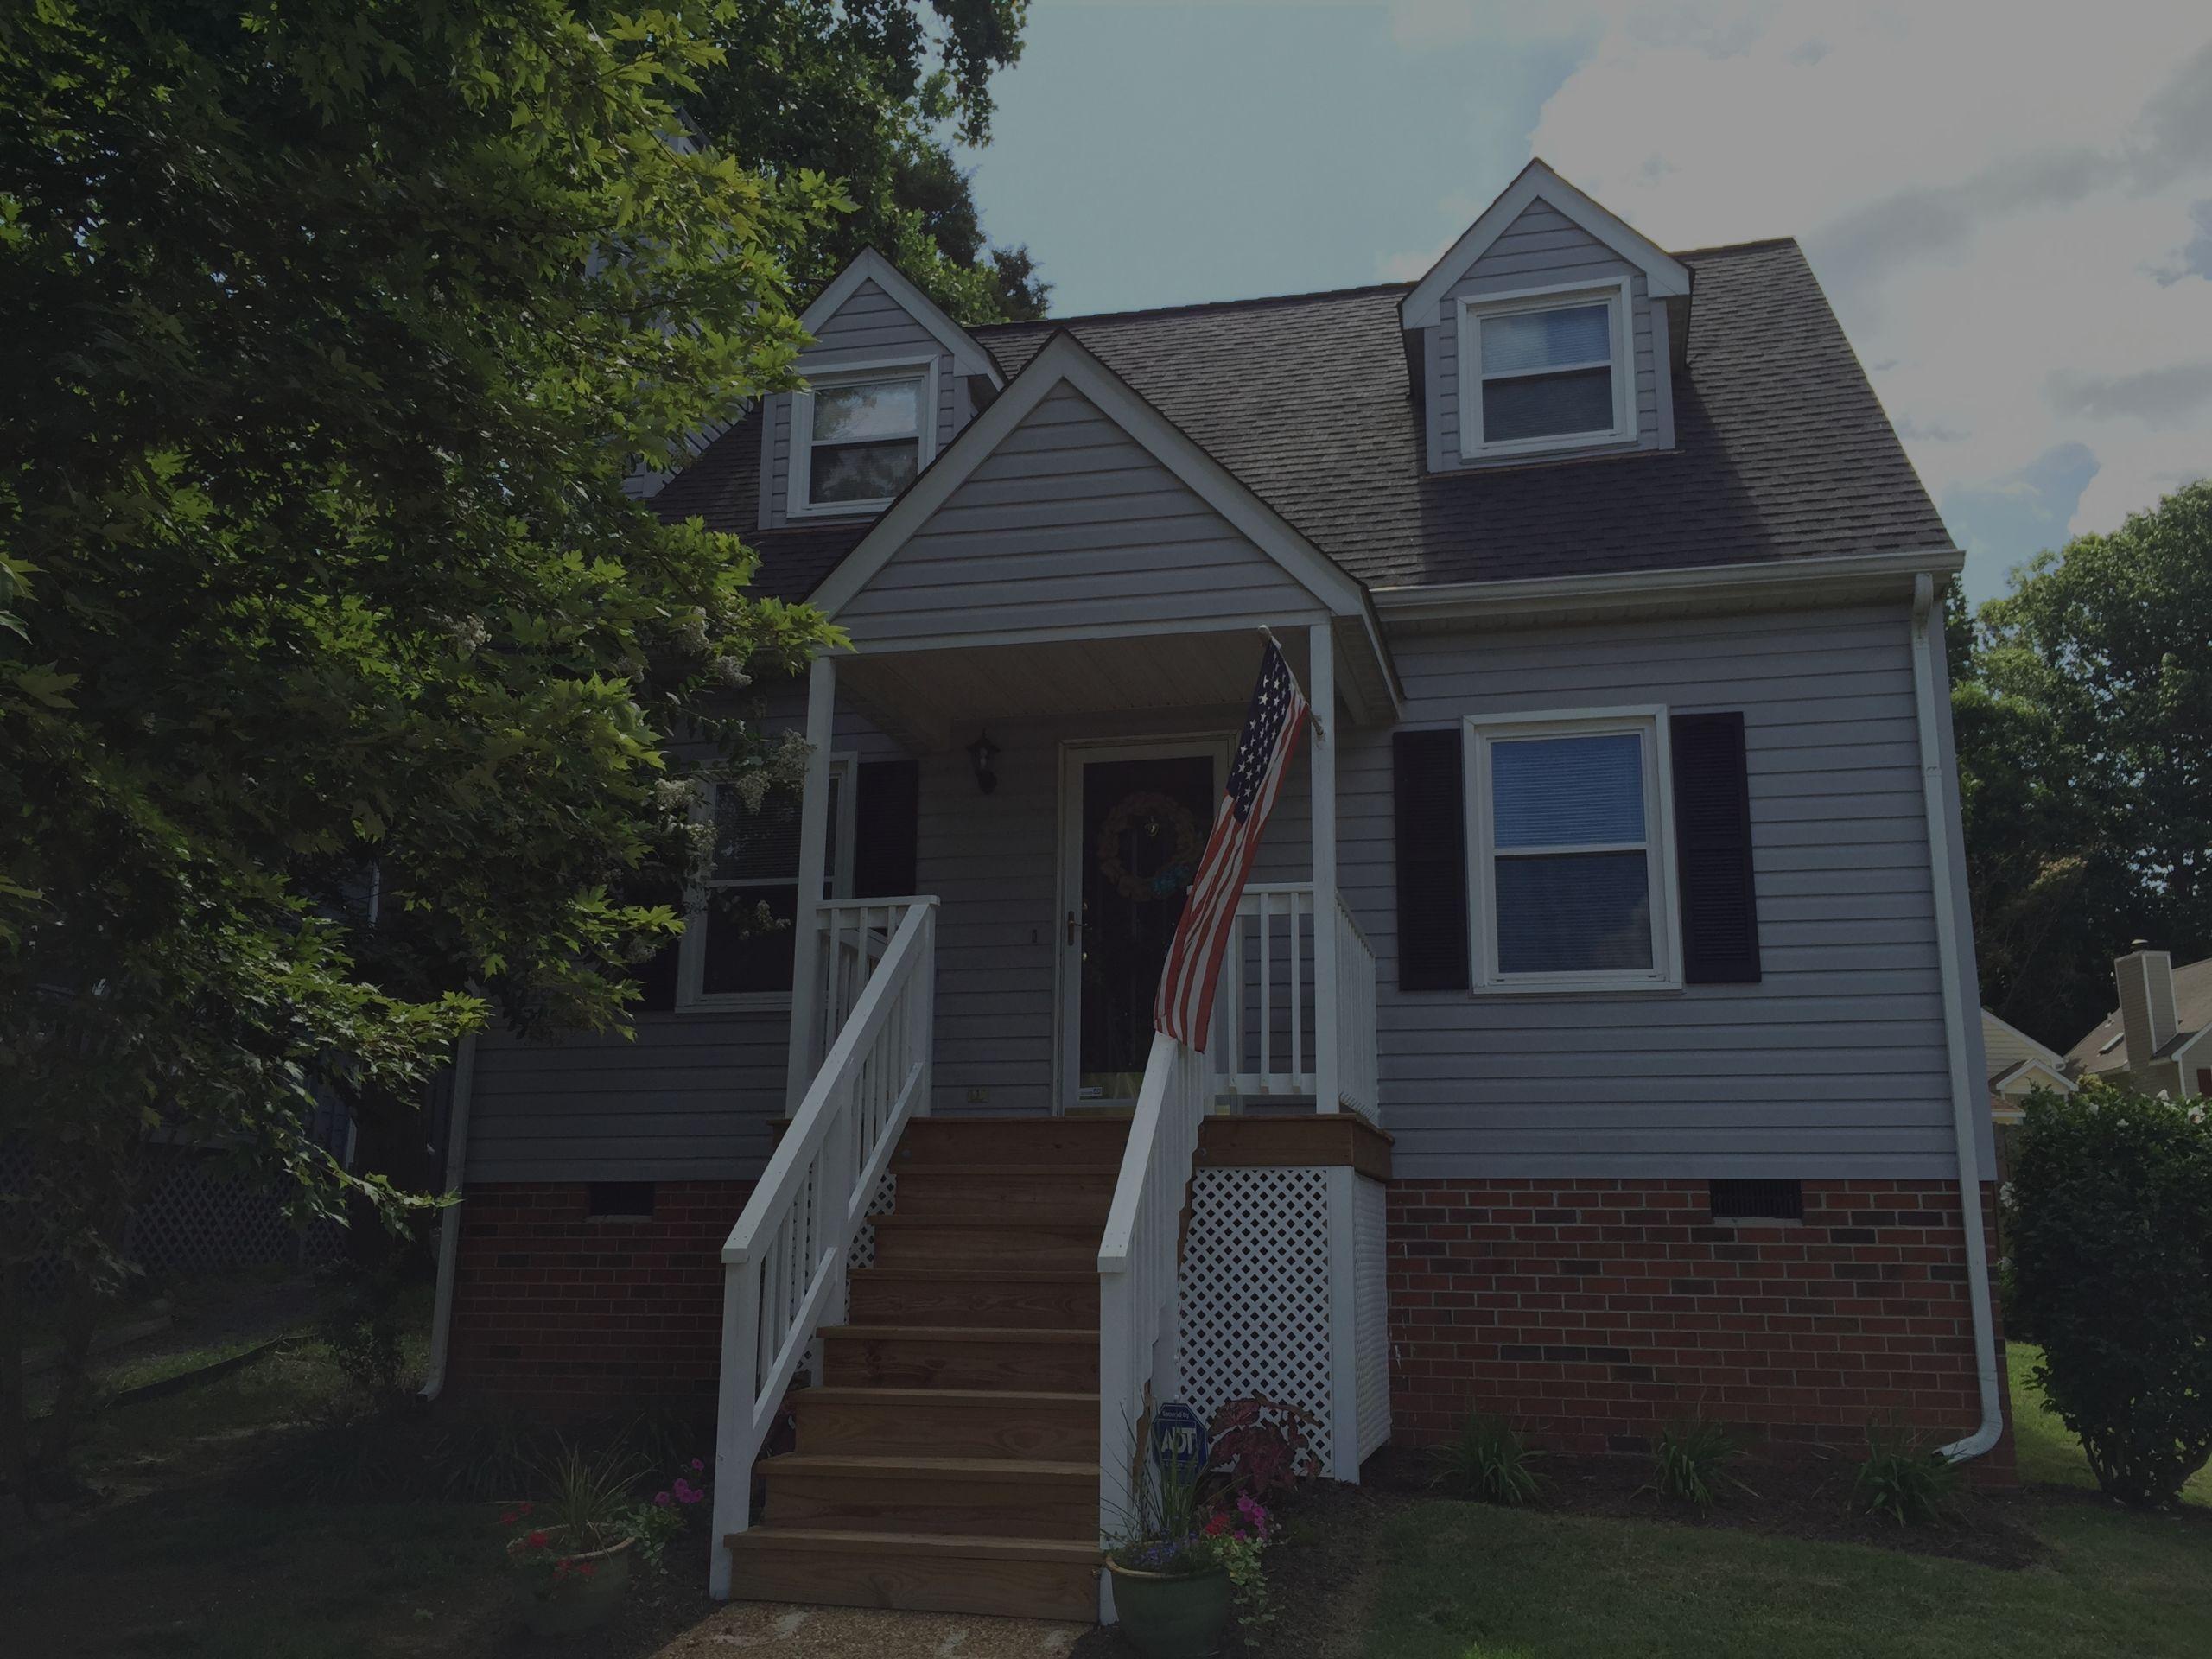 5 Reasons You Should Call Ashbrook Home